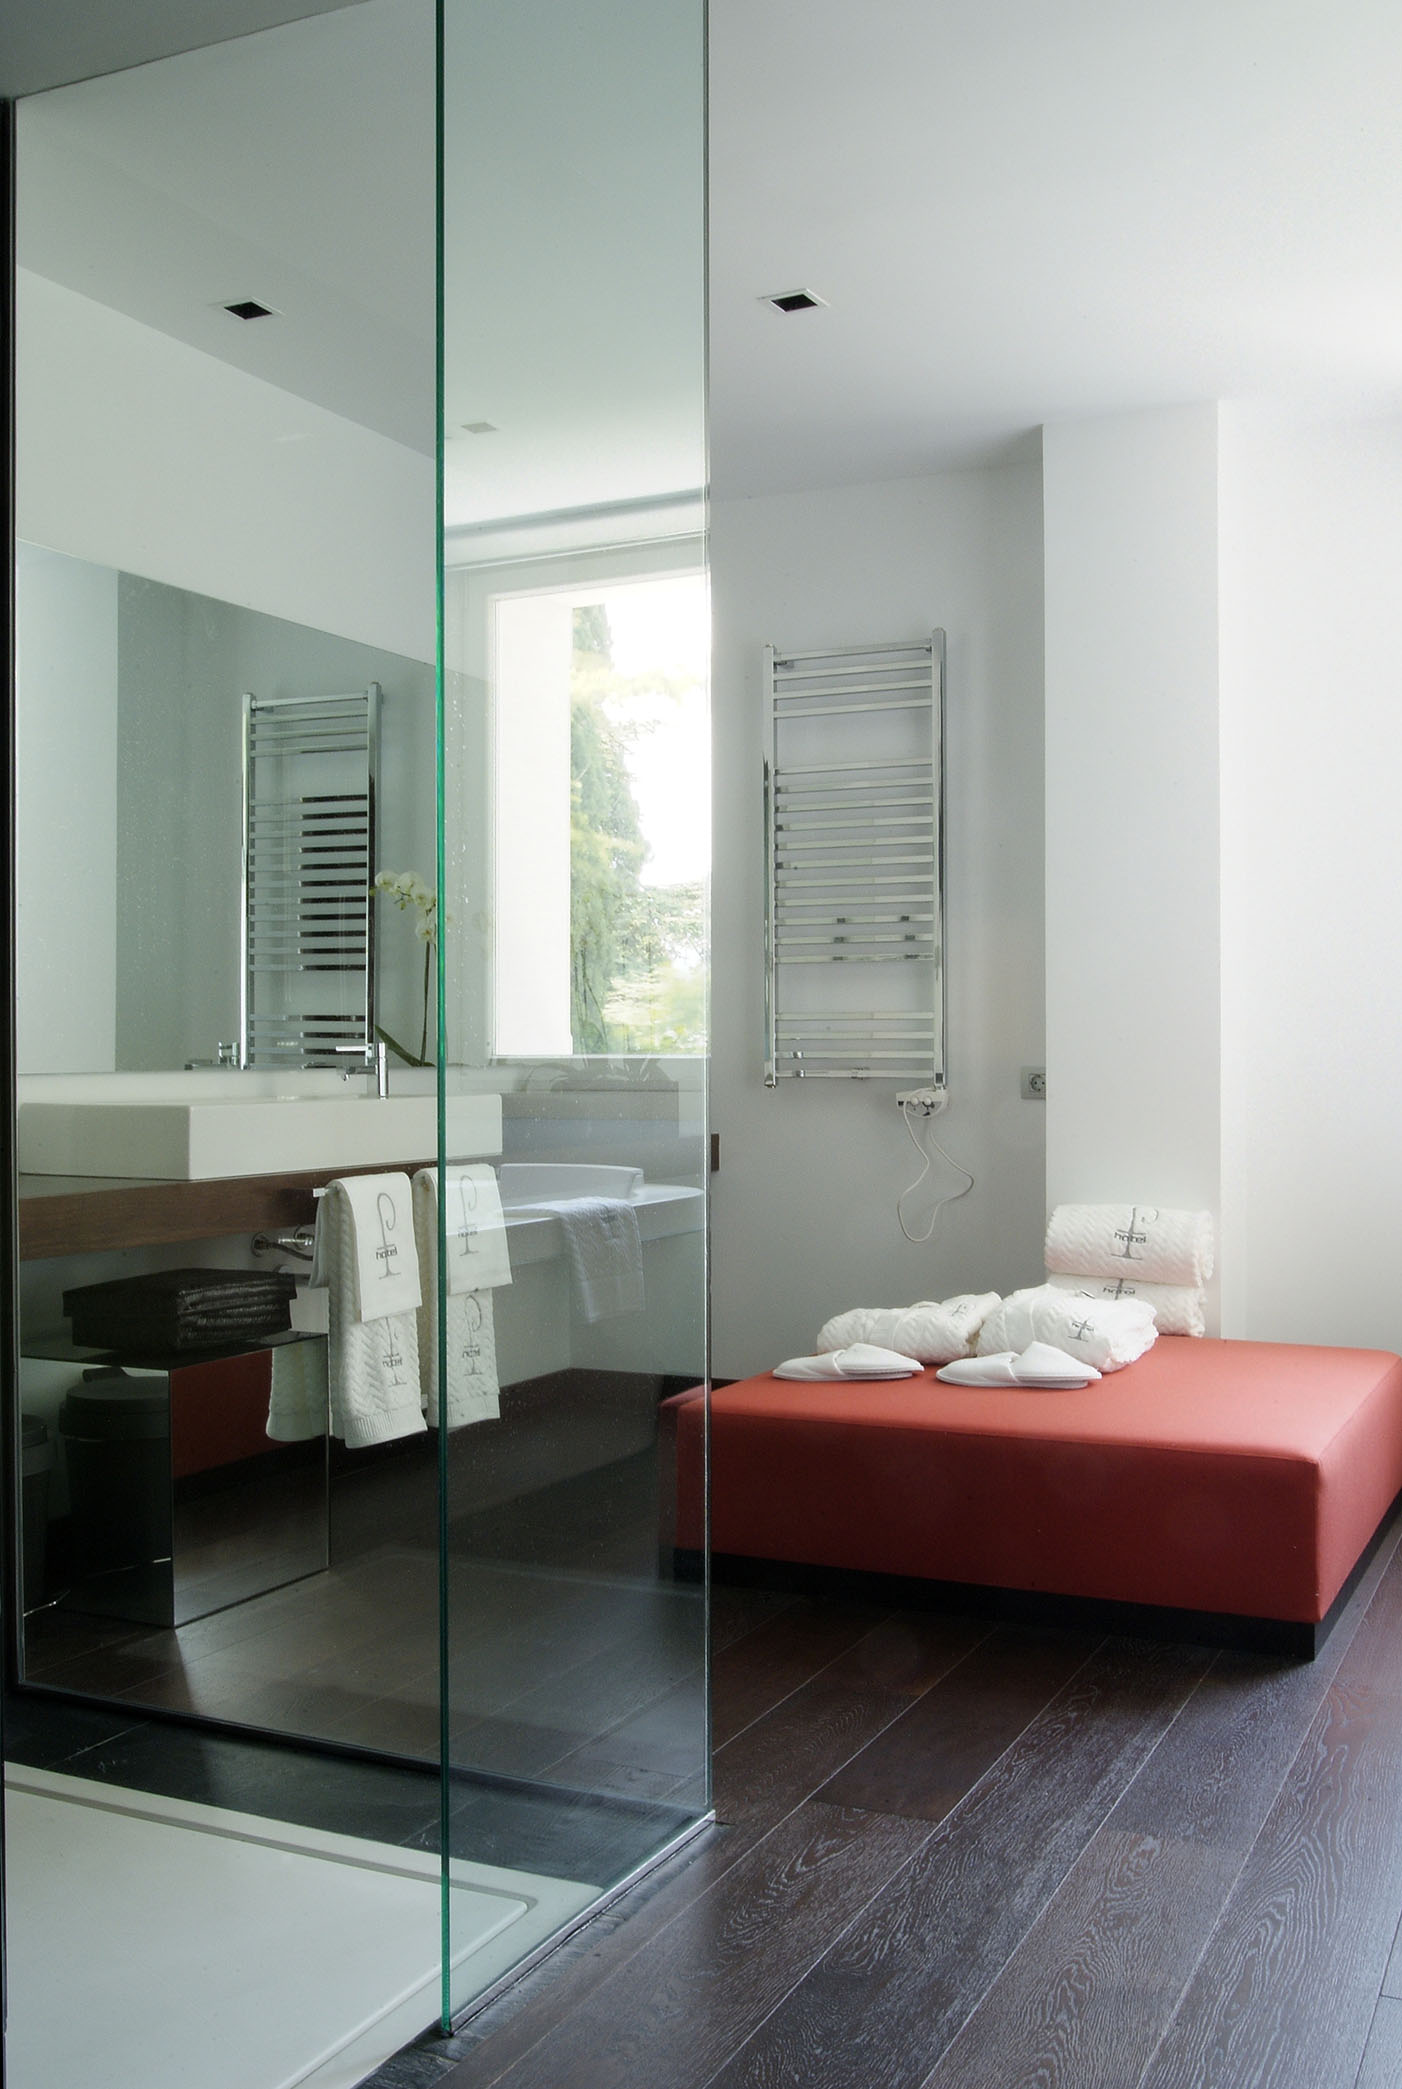 Design hotel ferrero for Designhotel 21